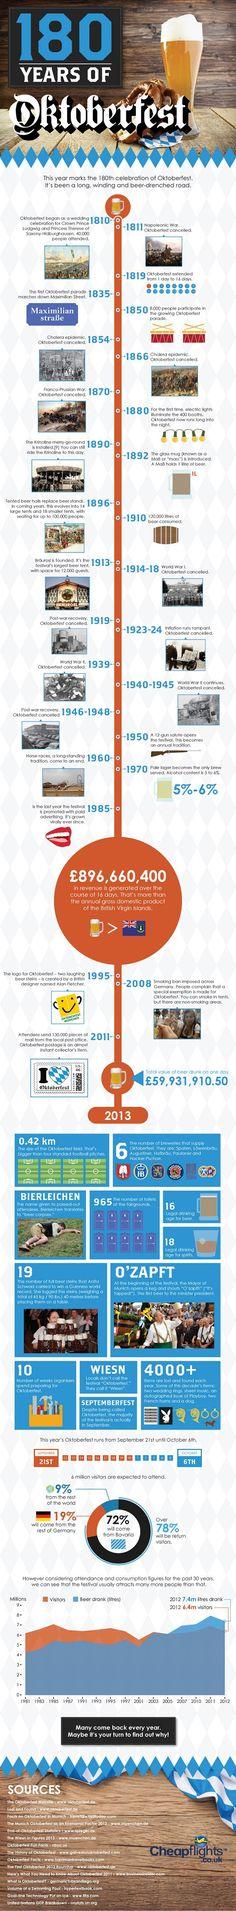 Oktoberfest infographic